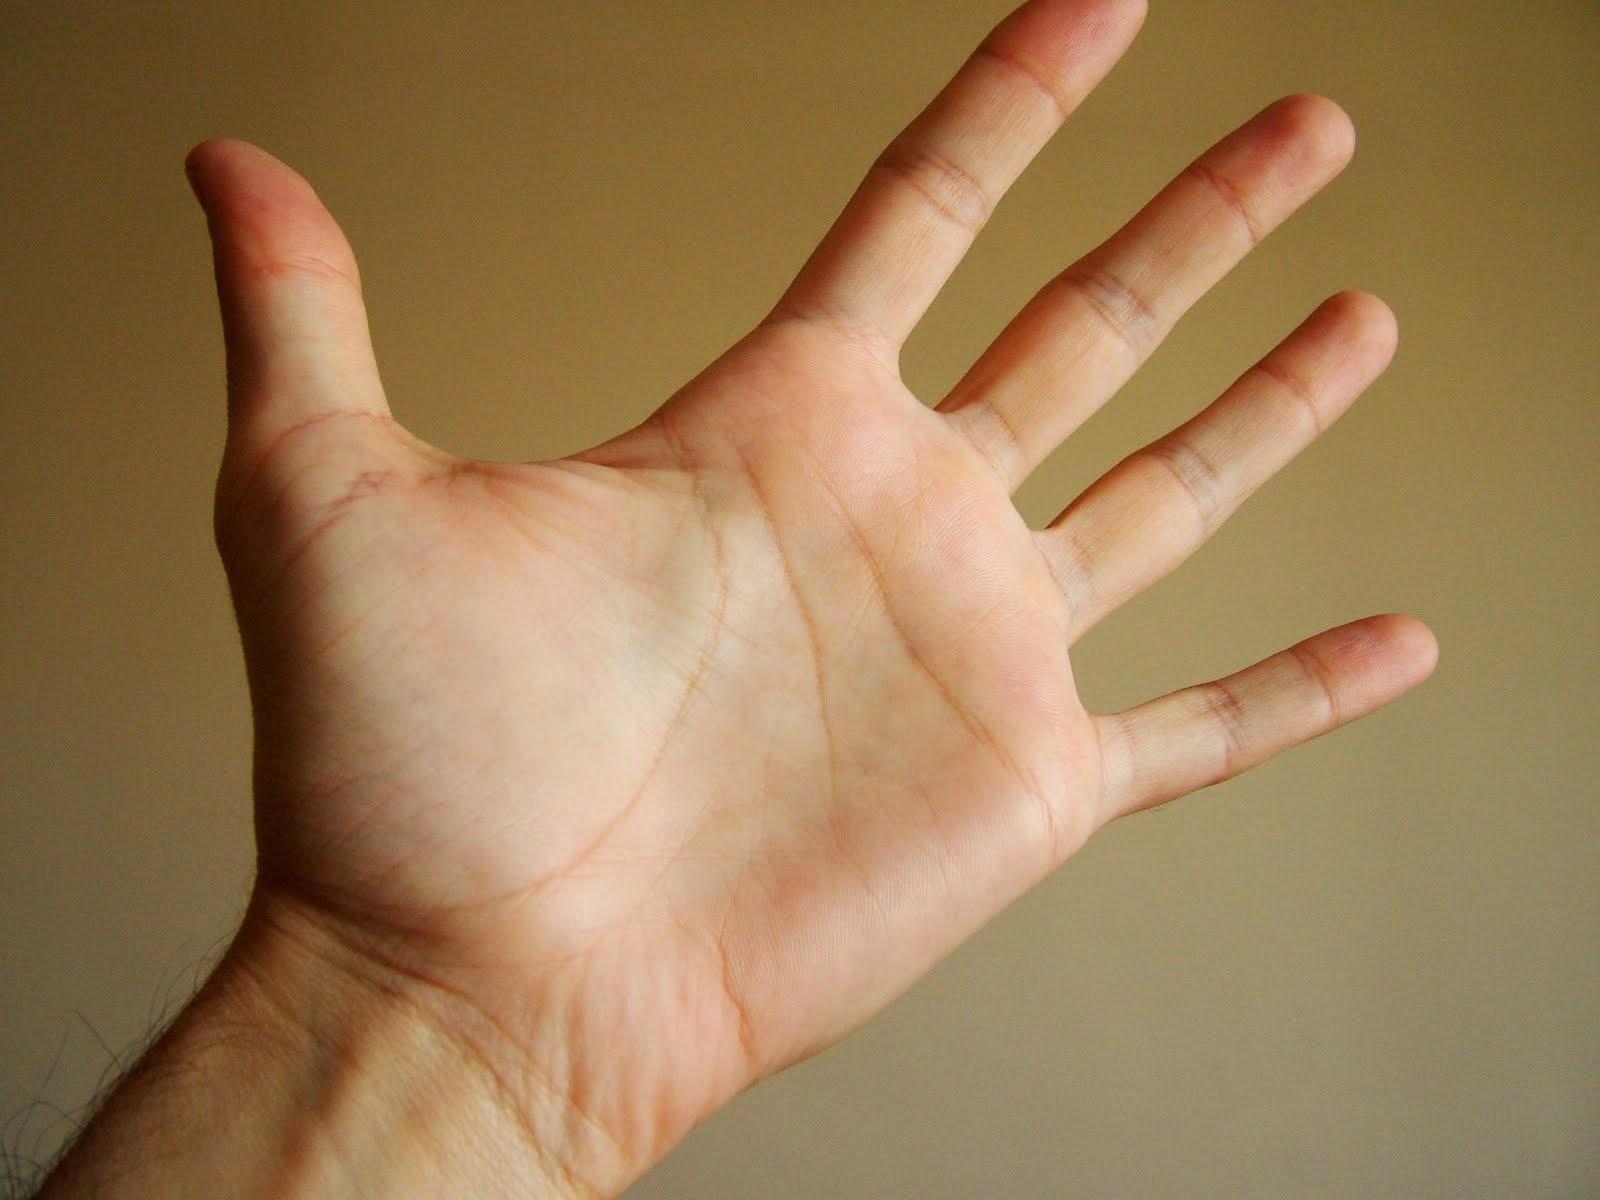 PunjabKesari, Palmistry, Palm, Lines, Hand, Hand image, हस्तरेखा